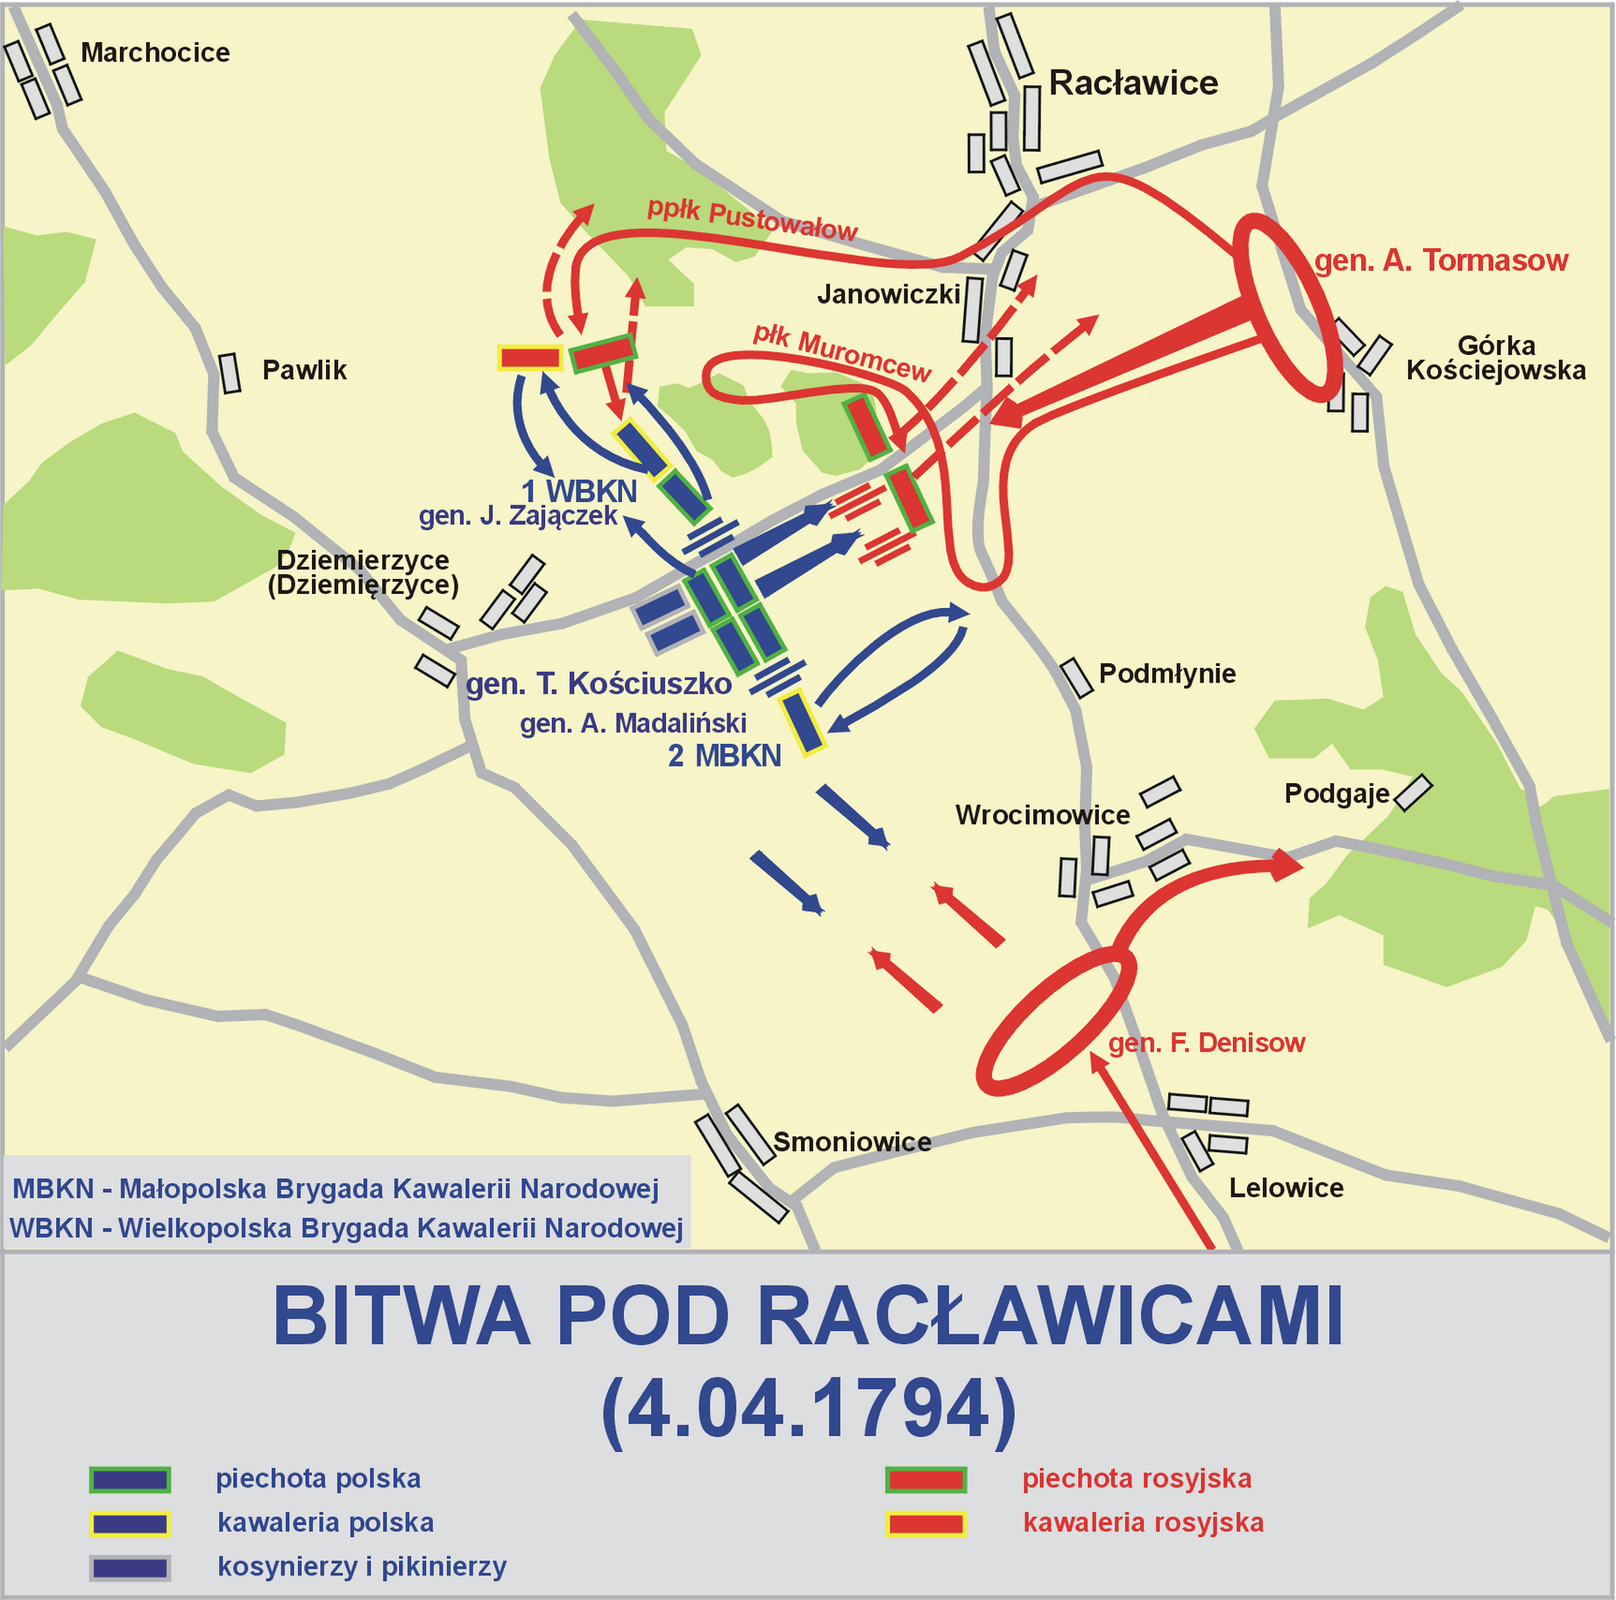 Plan Bitwy pod Racławicami 4 kwietnia 1794 r. Plan Bitwy pod Racławicami 4 kwietnia 1794 r. Źródło: Lonio17, Wikimedia Commons, licencja: CC BY-SA 4.0.